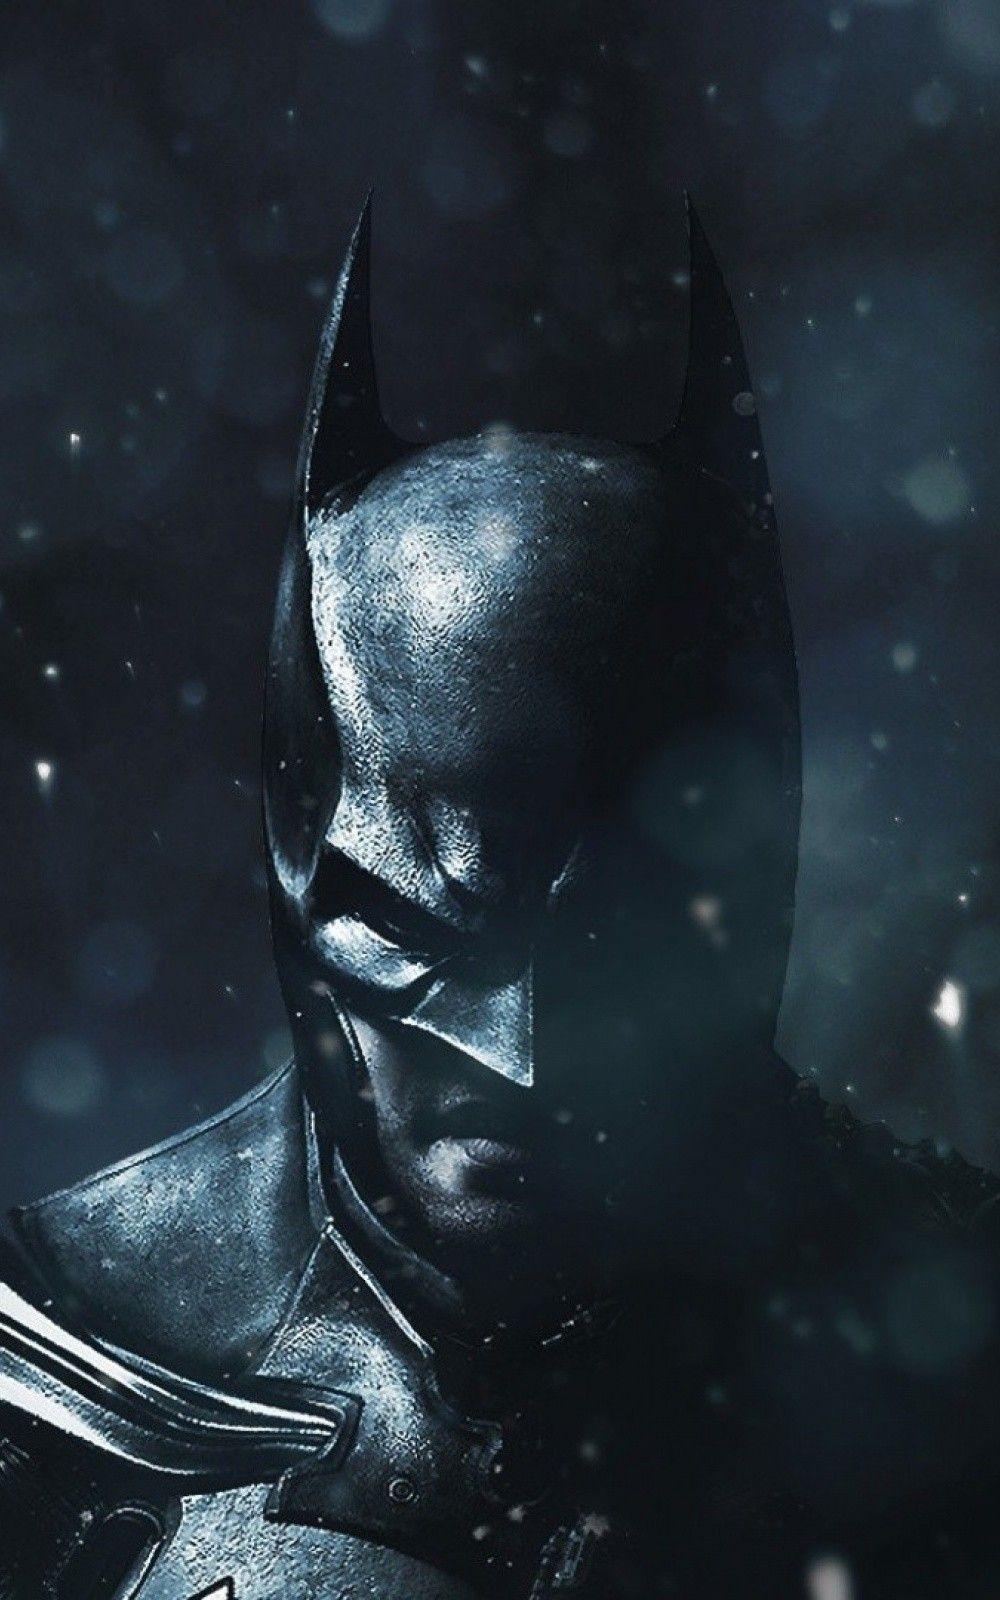 Batman Phone Wallpapers Top Free Batman Phone Backgrounds